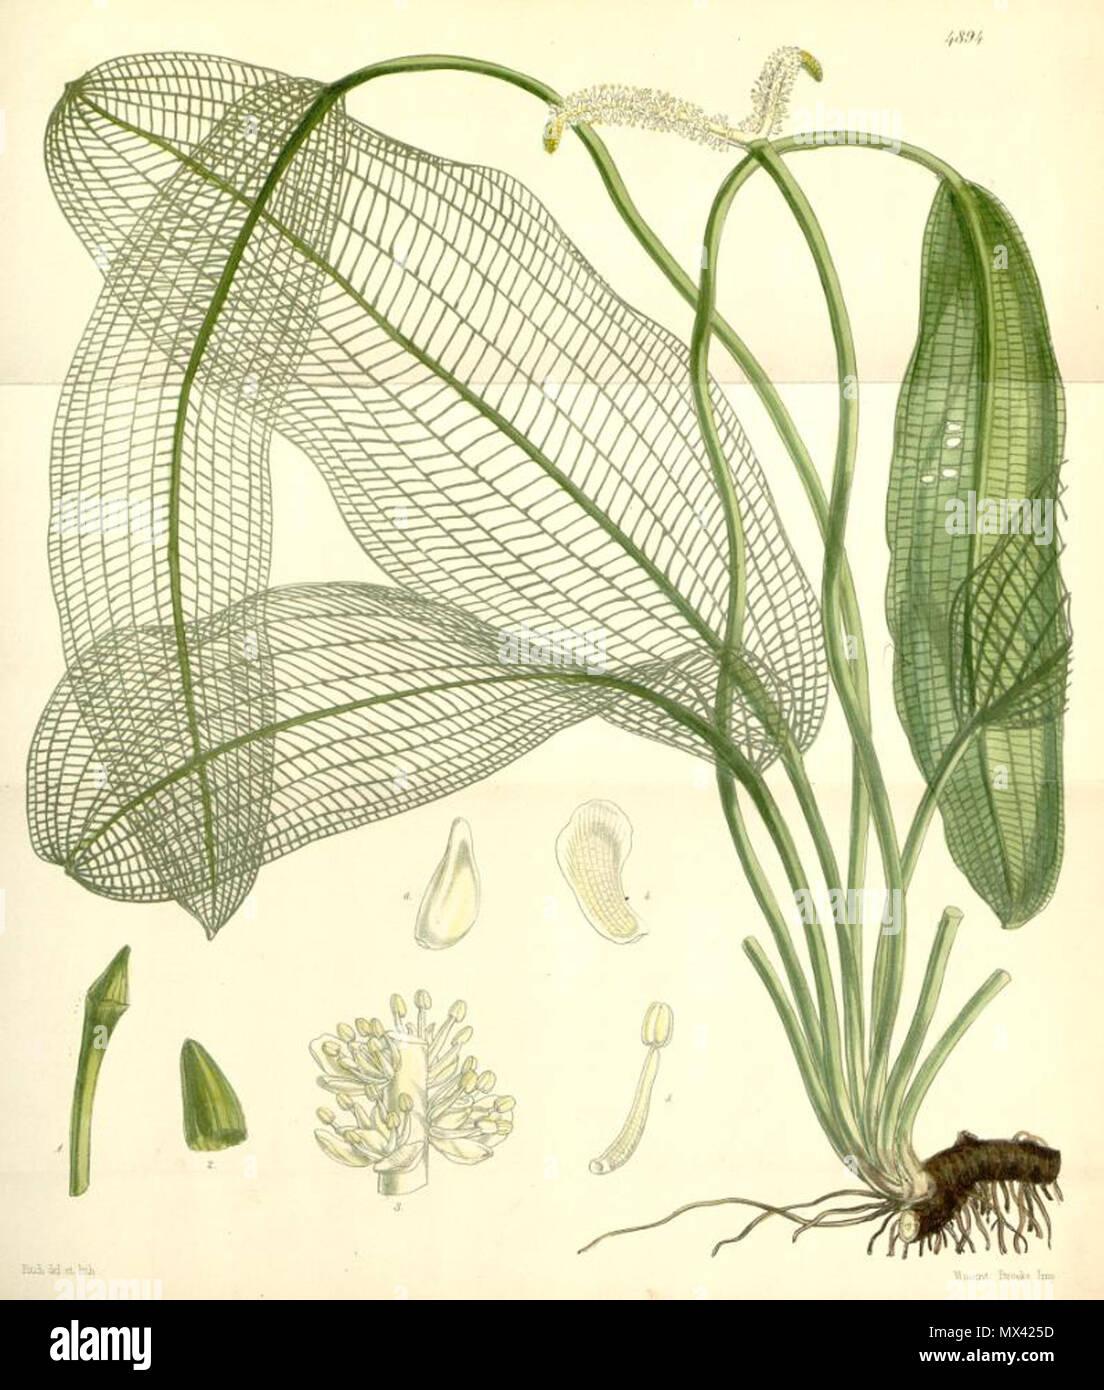 . Illustration of Aponogeton madgascariensis (Syn. Ouvirandra fenestralis) . 1856. Sir William Jackson Hooker (1785 - 1865) 53 Aponogeton madagascariensis - Stock Image